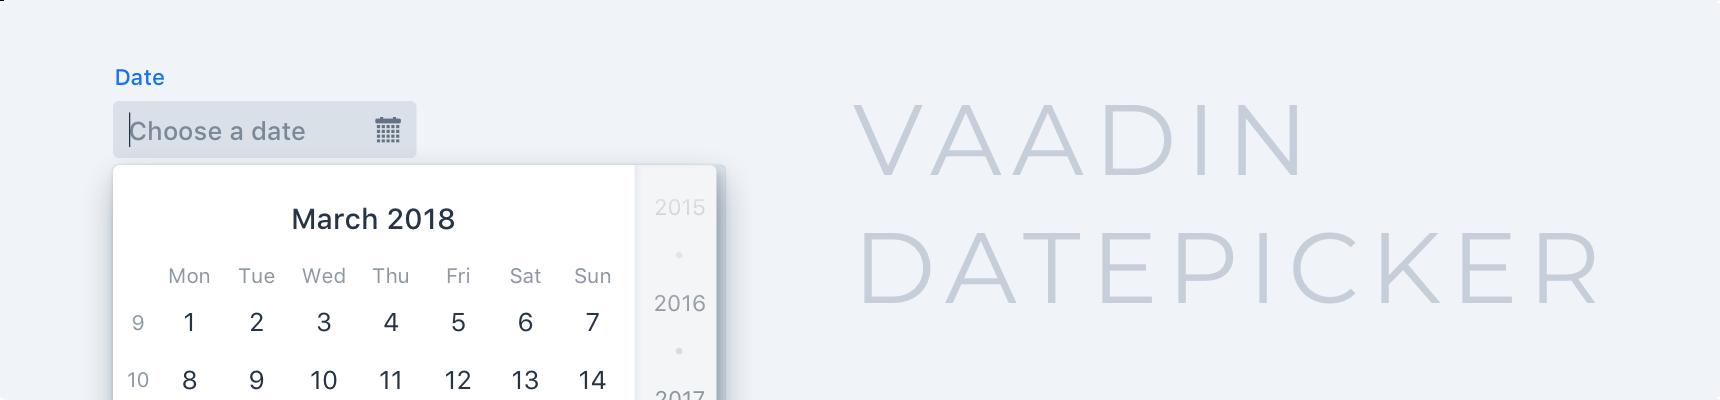 Date Picker | Components | Vaadin